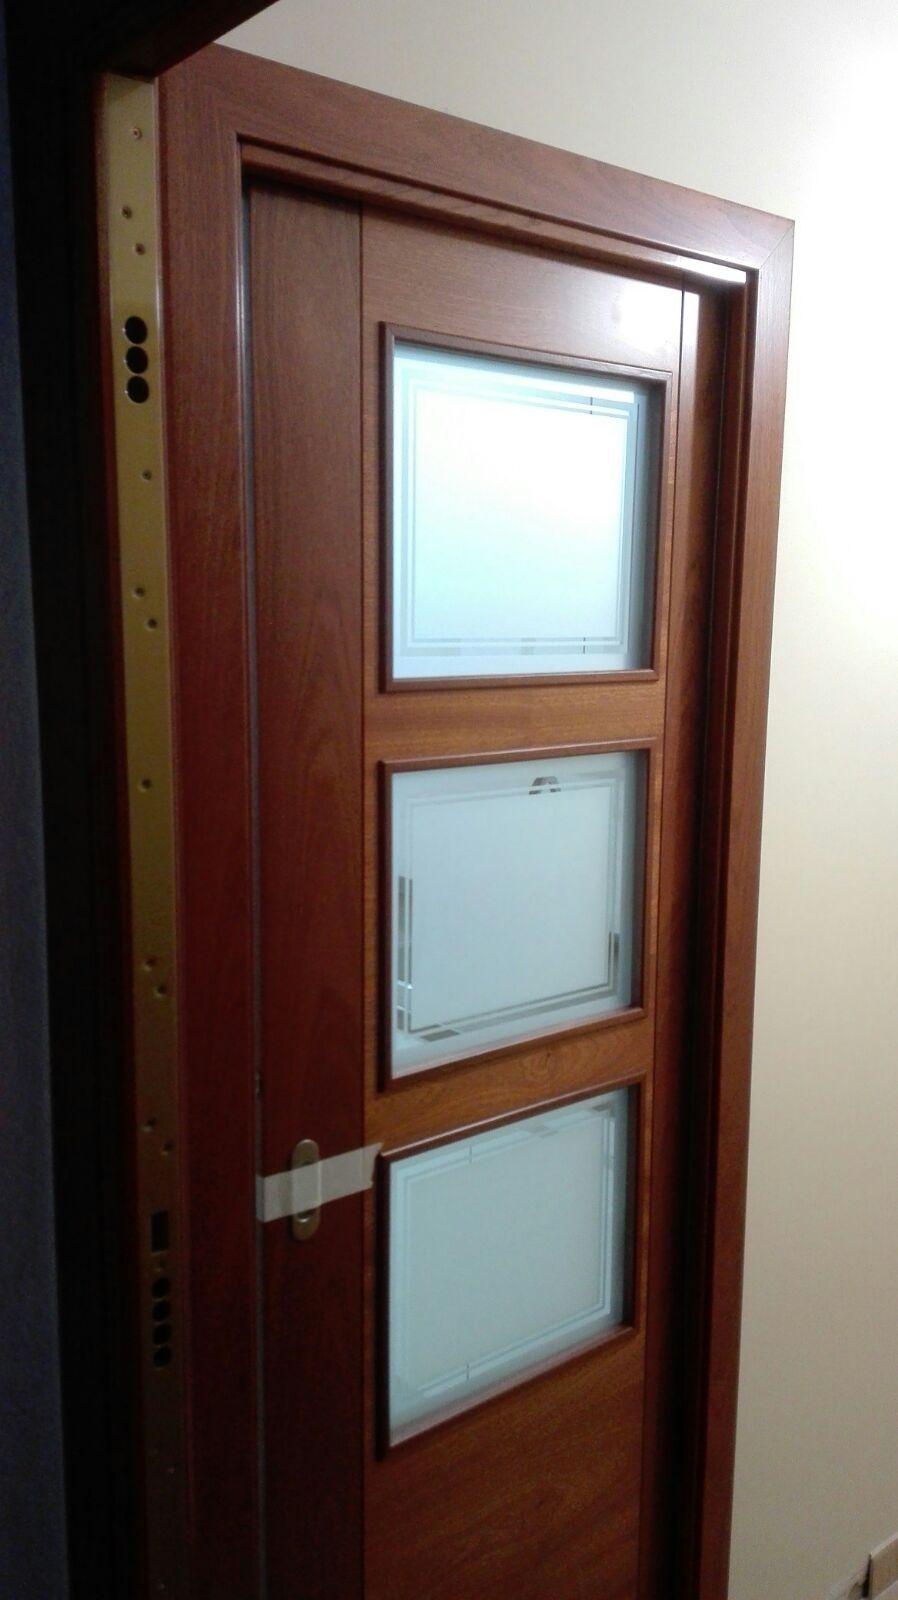 Puerta Modelo Rubi Sapelly Rameado Vidrieras Con Cristal Con  ~ Puertas Correderas Para Vestidores